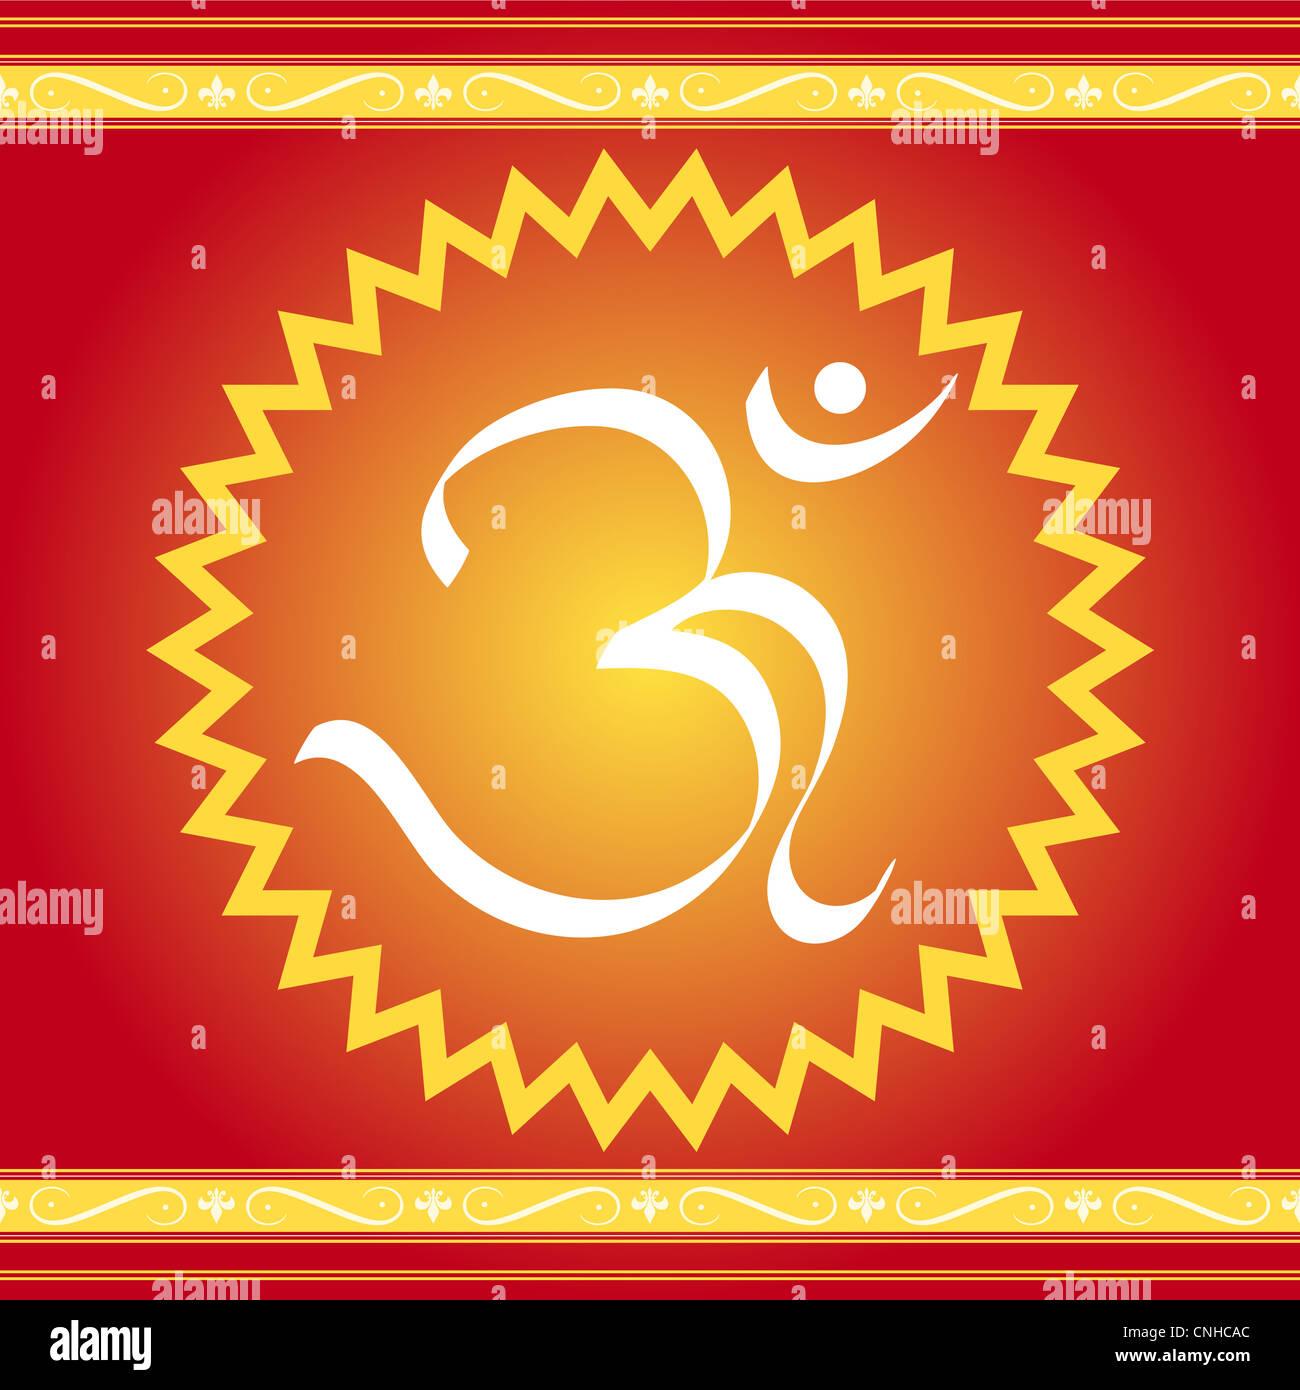 Divine OM symbol with artistic frame - Stock Image